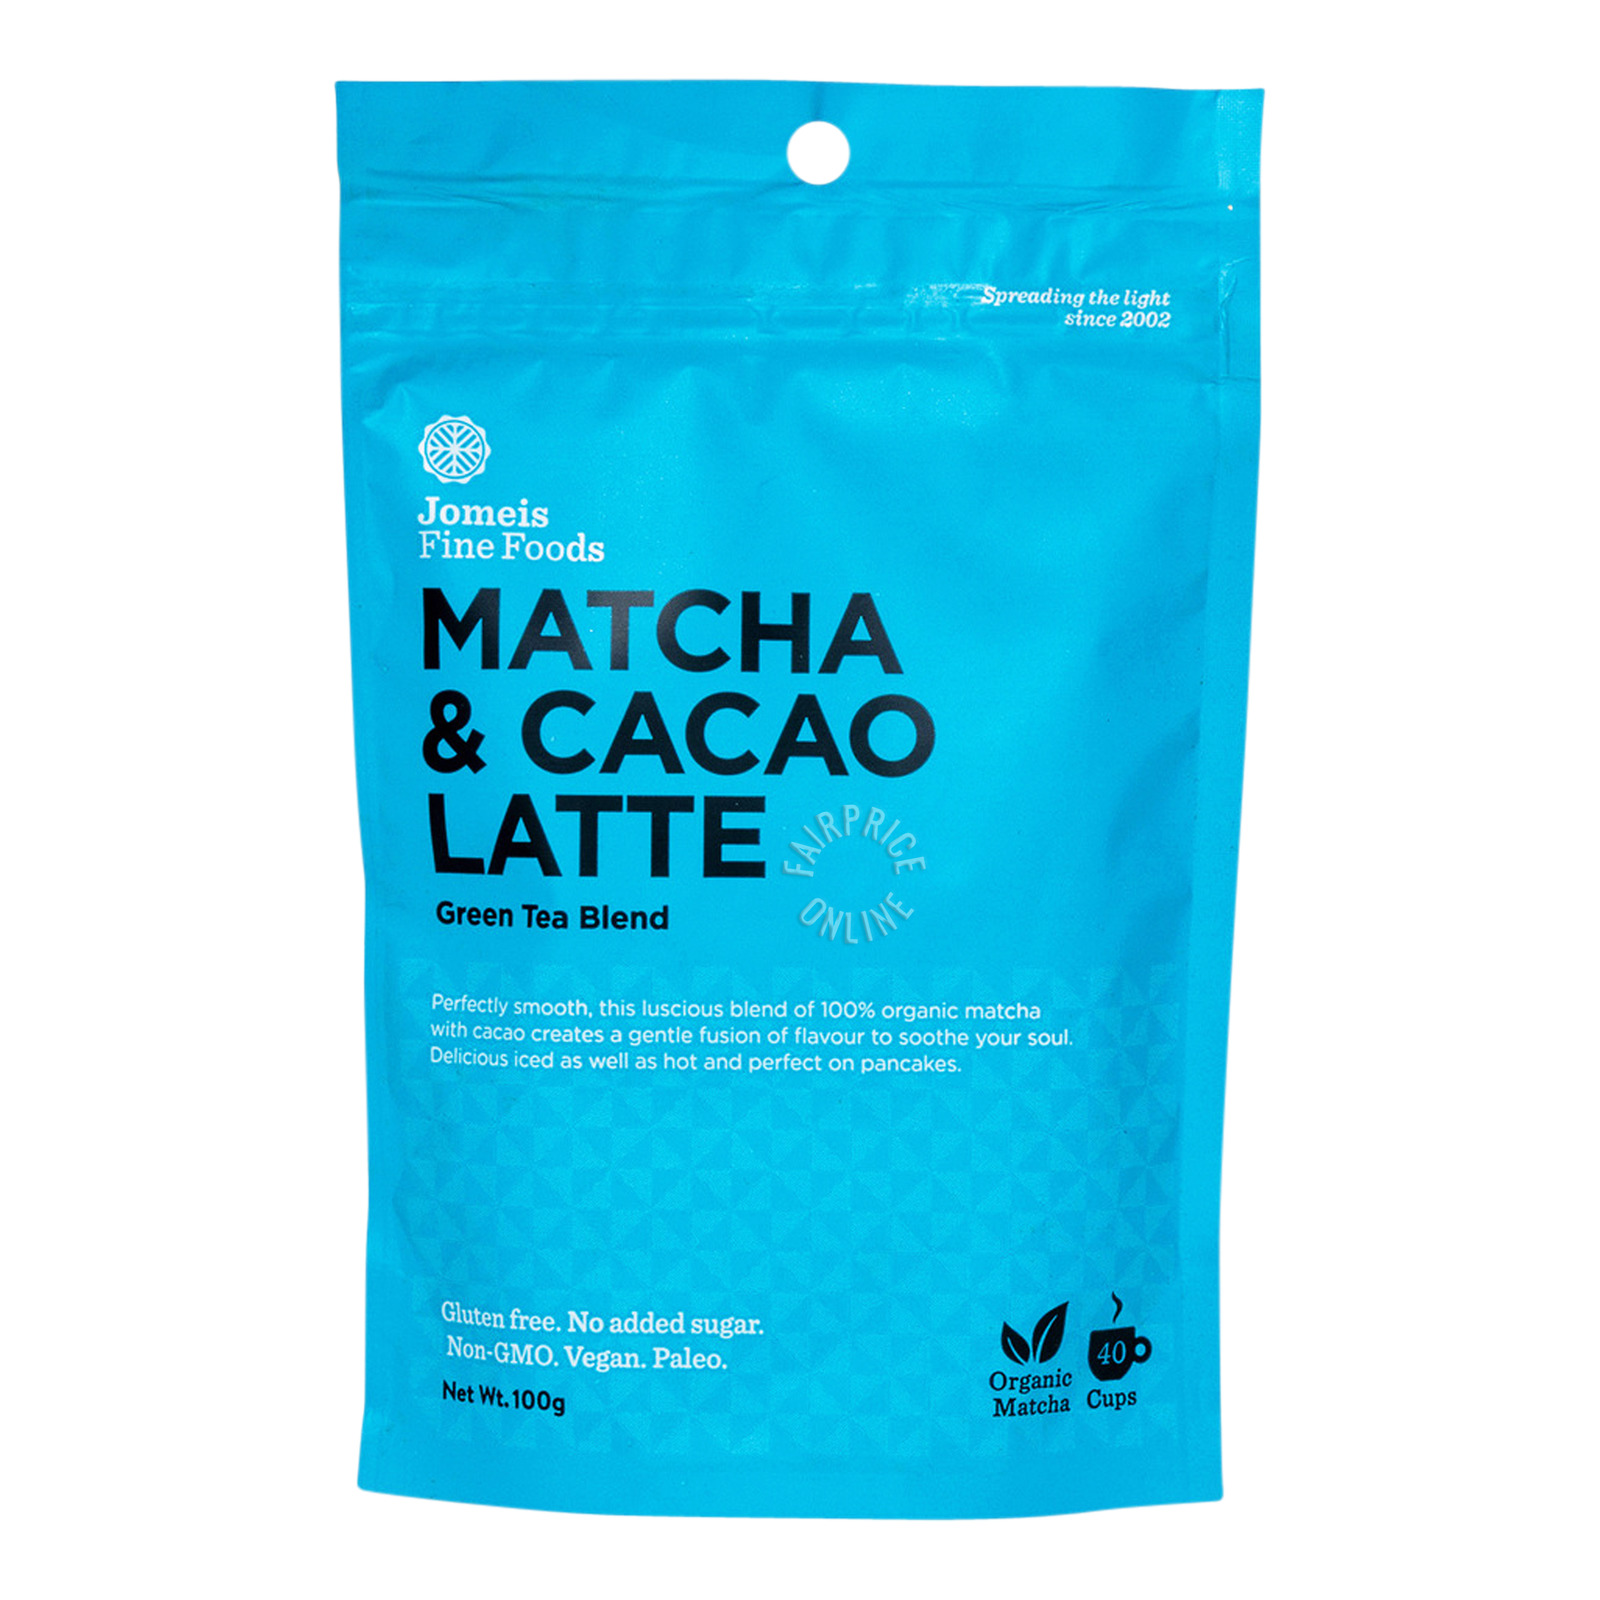 Jomeis Fine Foods Latte - Matcha & Cacao